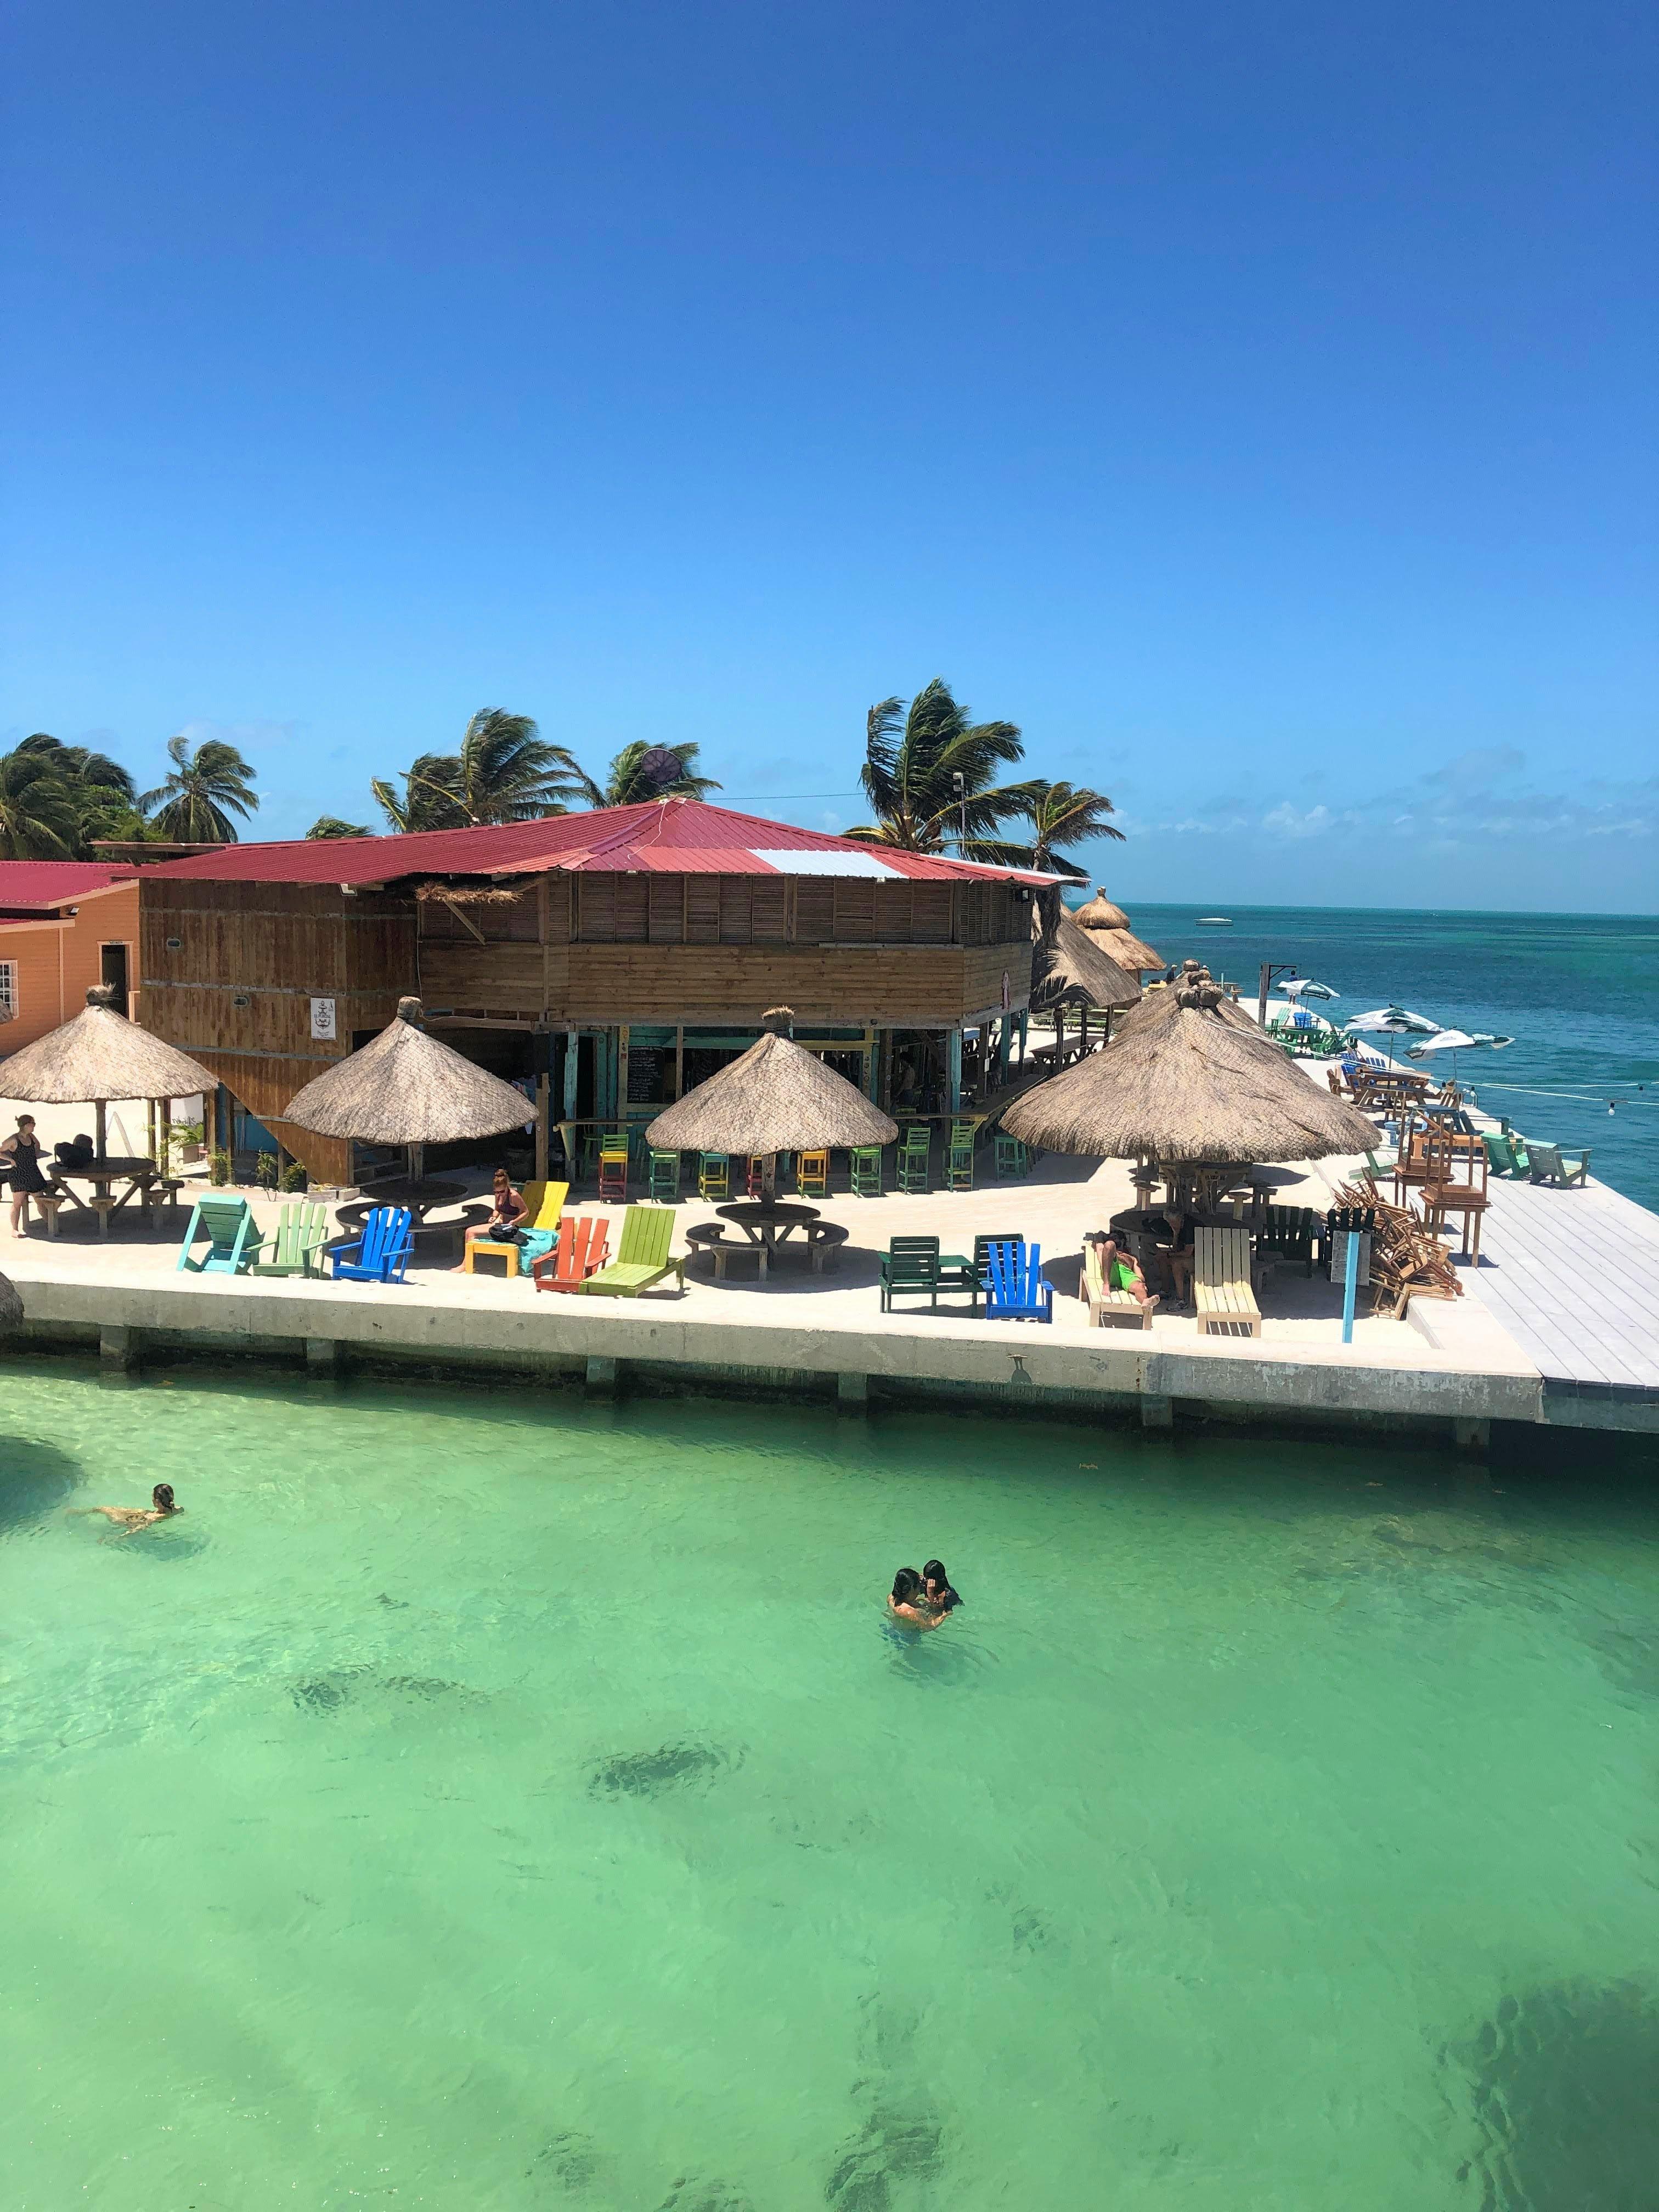 Lazy Lizard beach bar on Caye Caulker